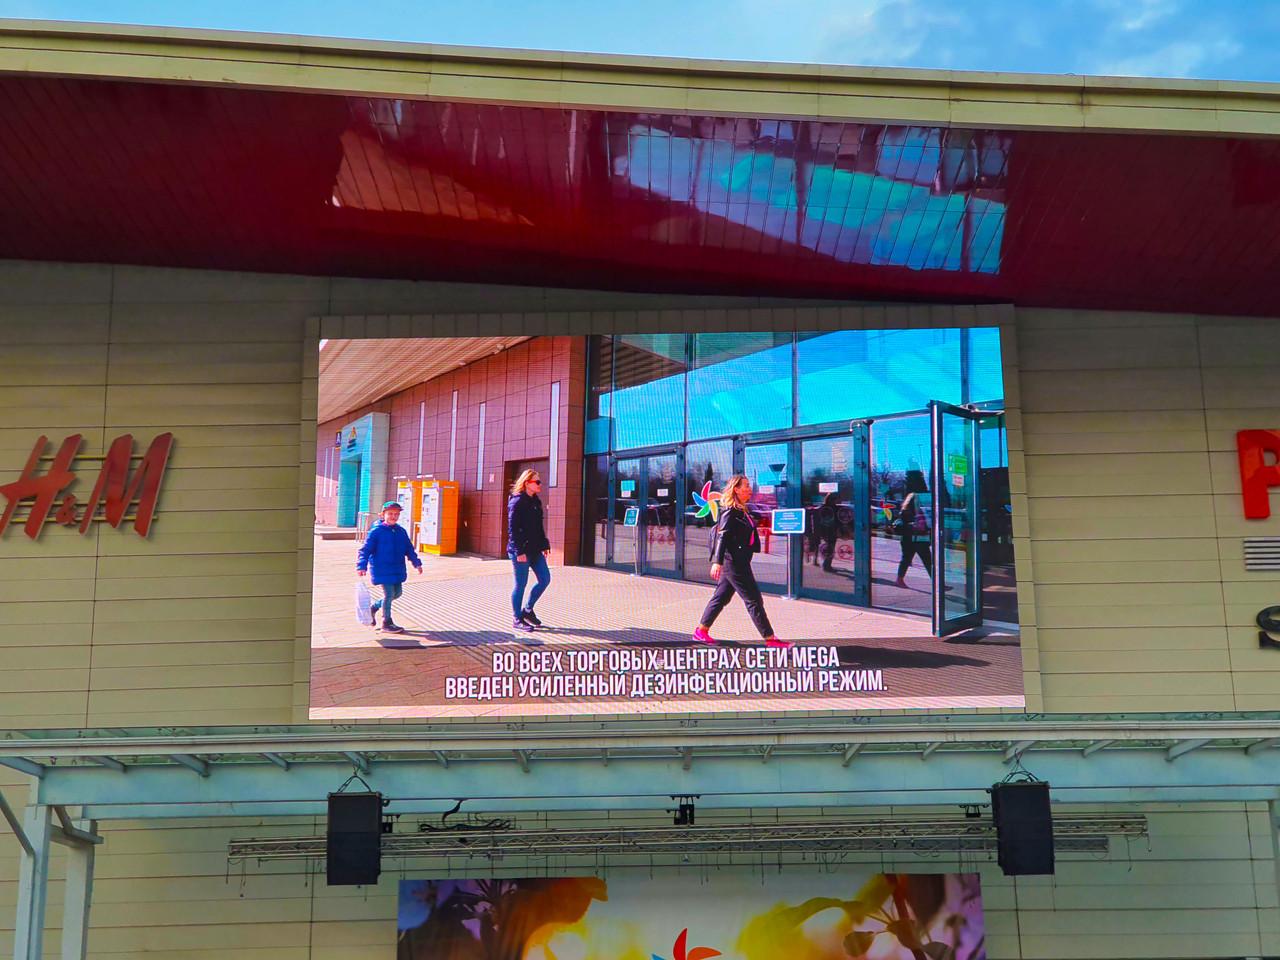 Реклама на Амфитеатре (МЕГА АЛМА-АТА)